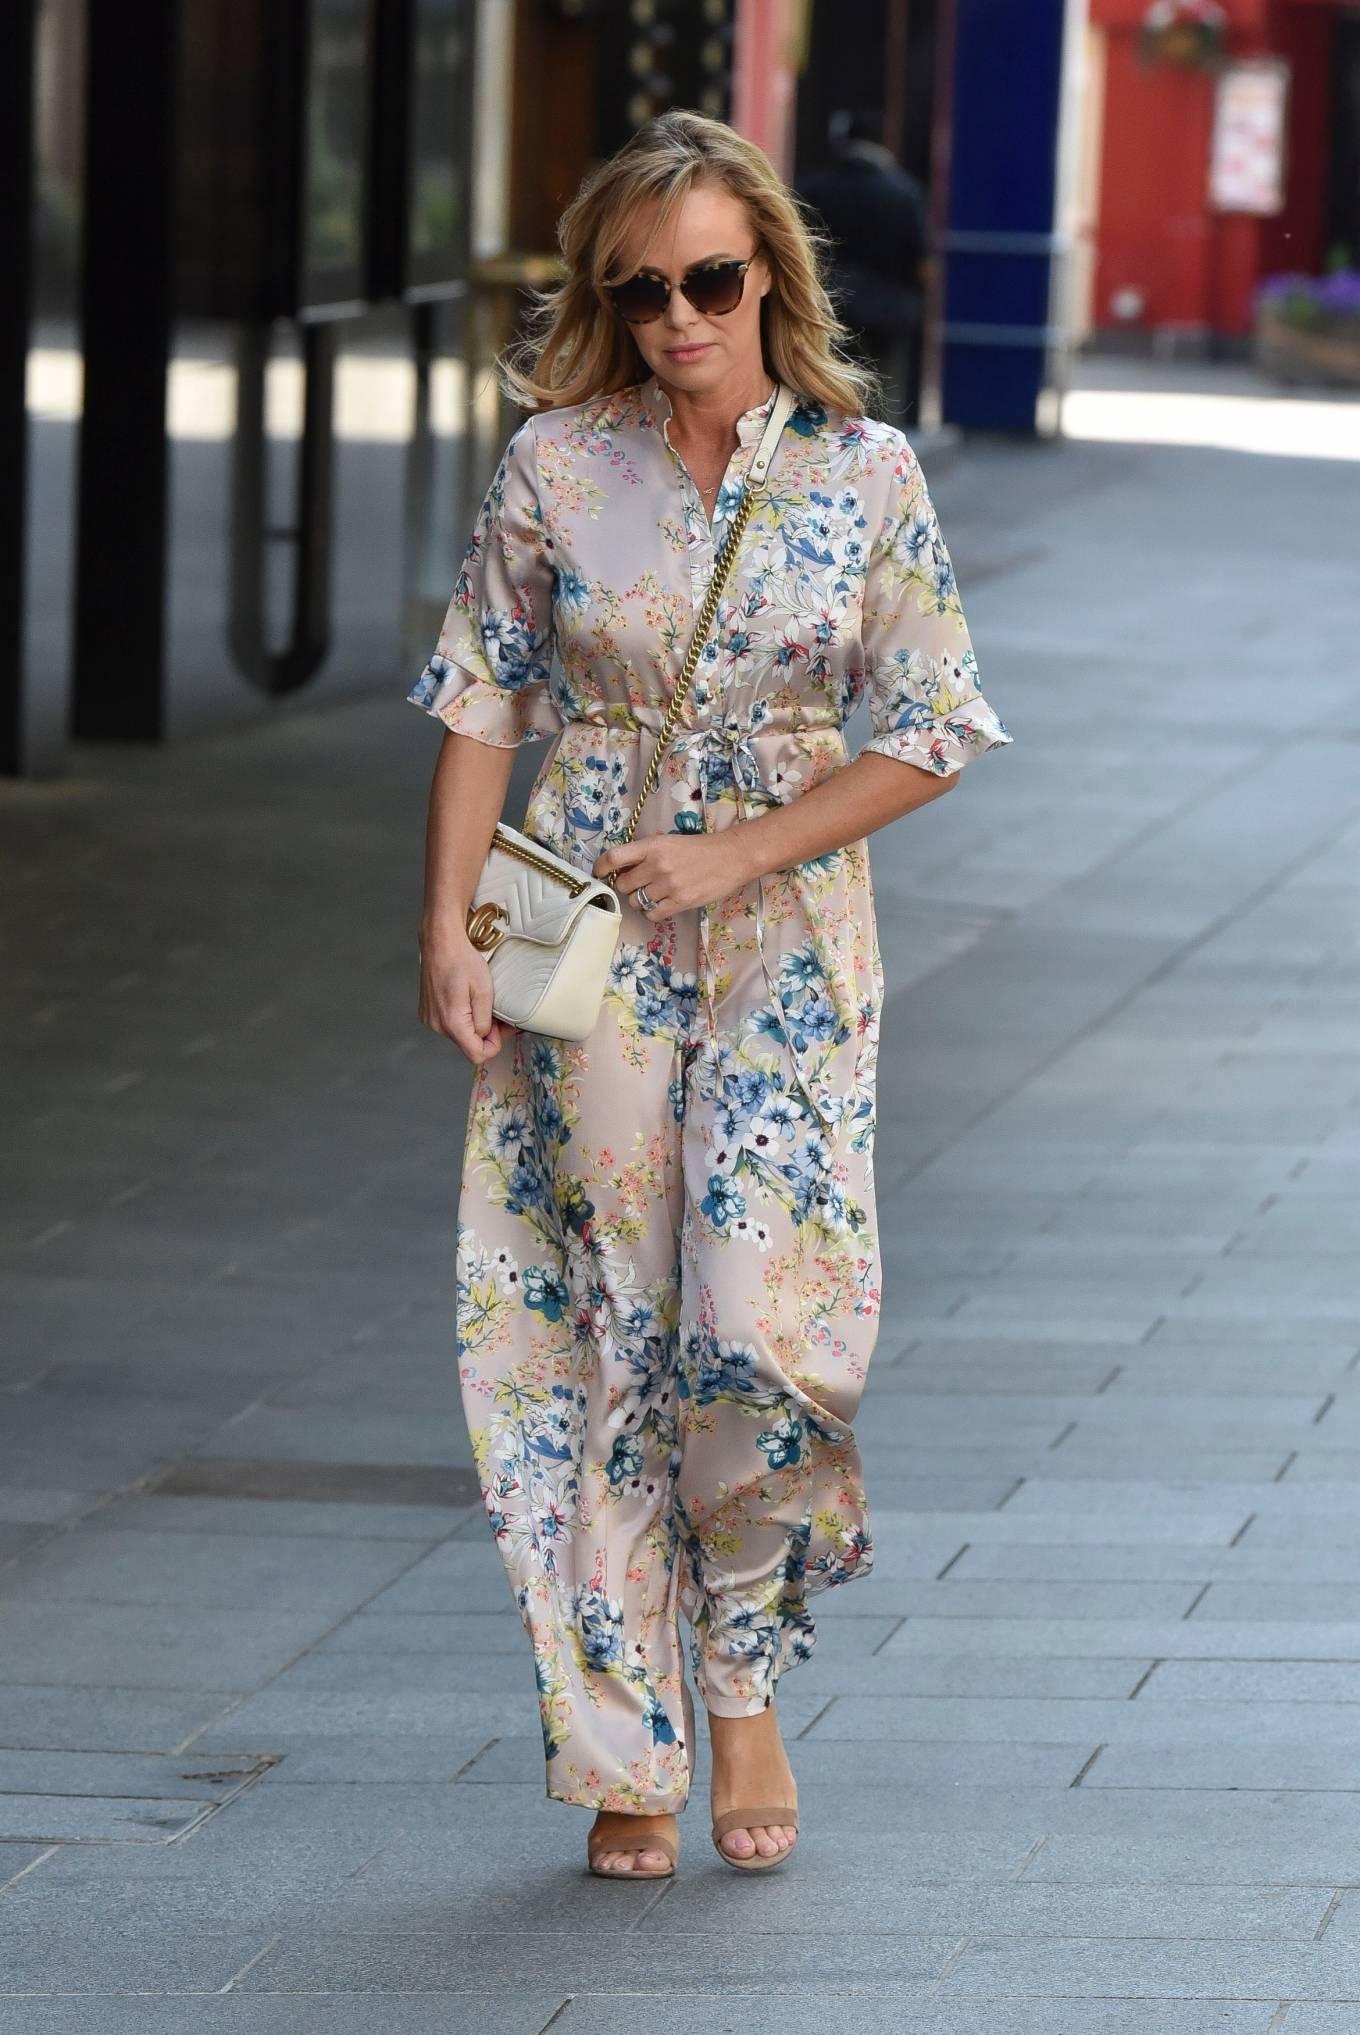 Amanda Holden 2020 : Amanda Holden – Spotted in floral jumpsuit at Global Radio Studios-01